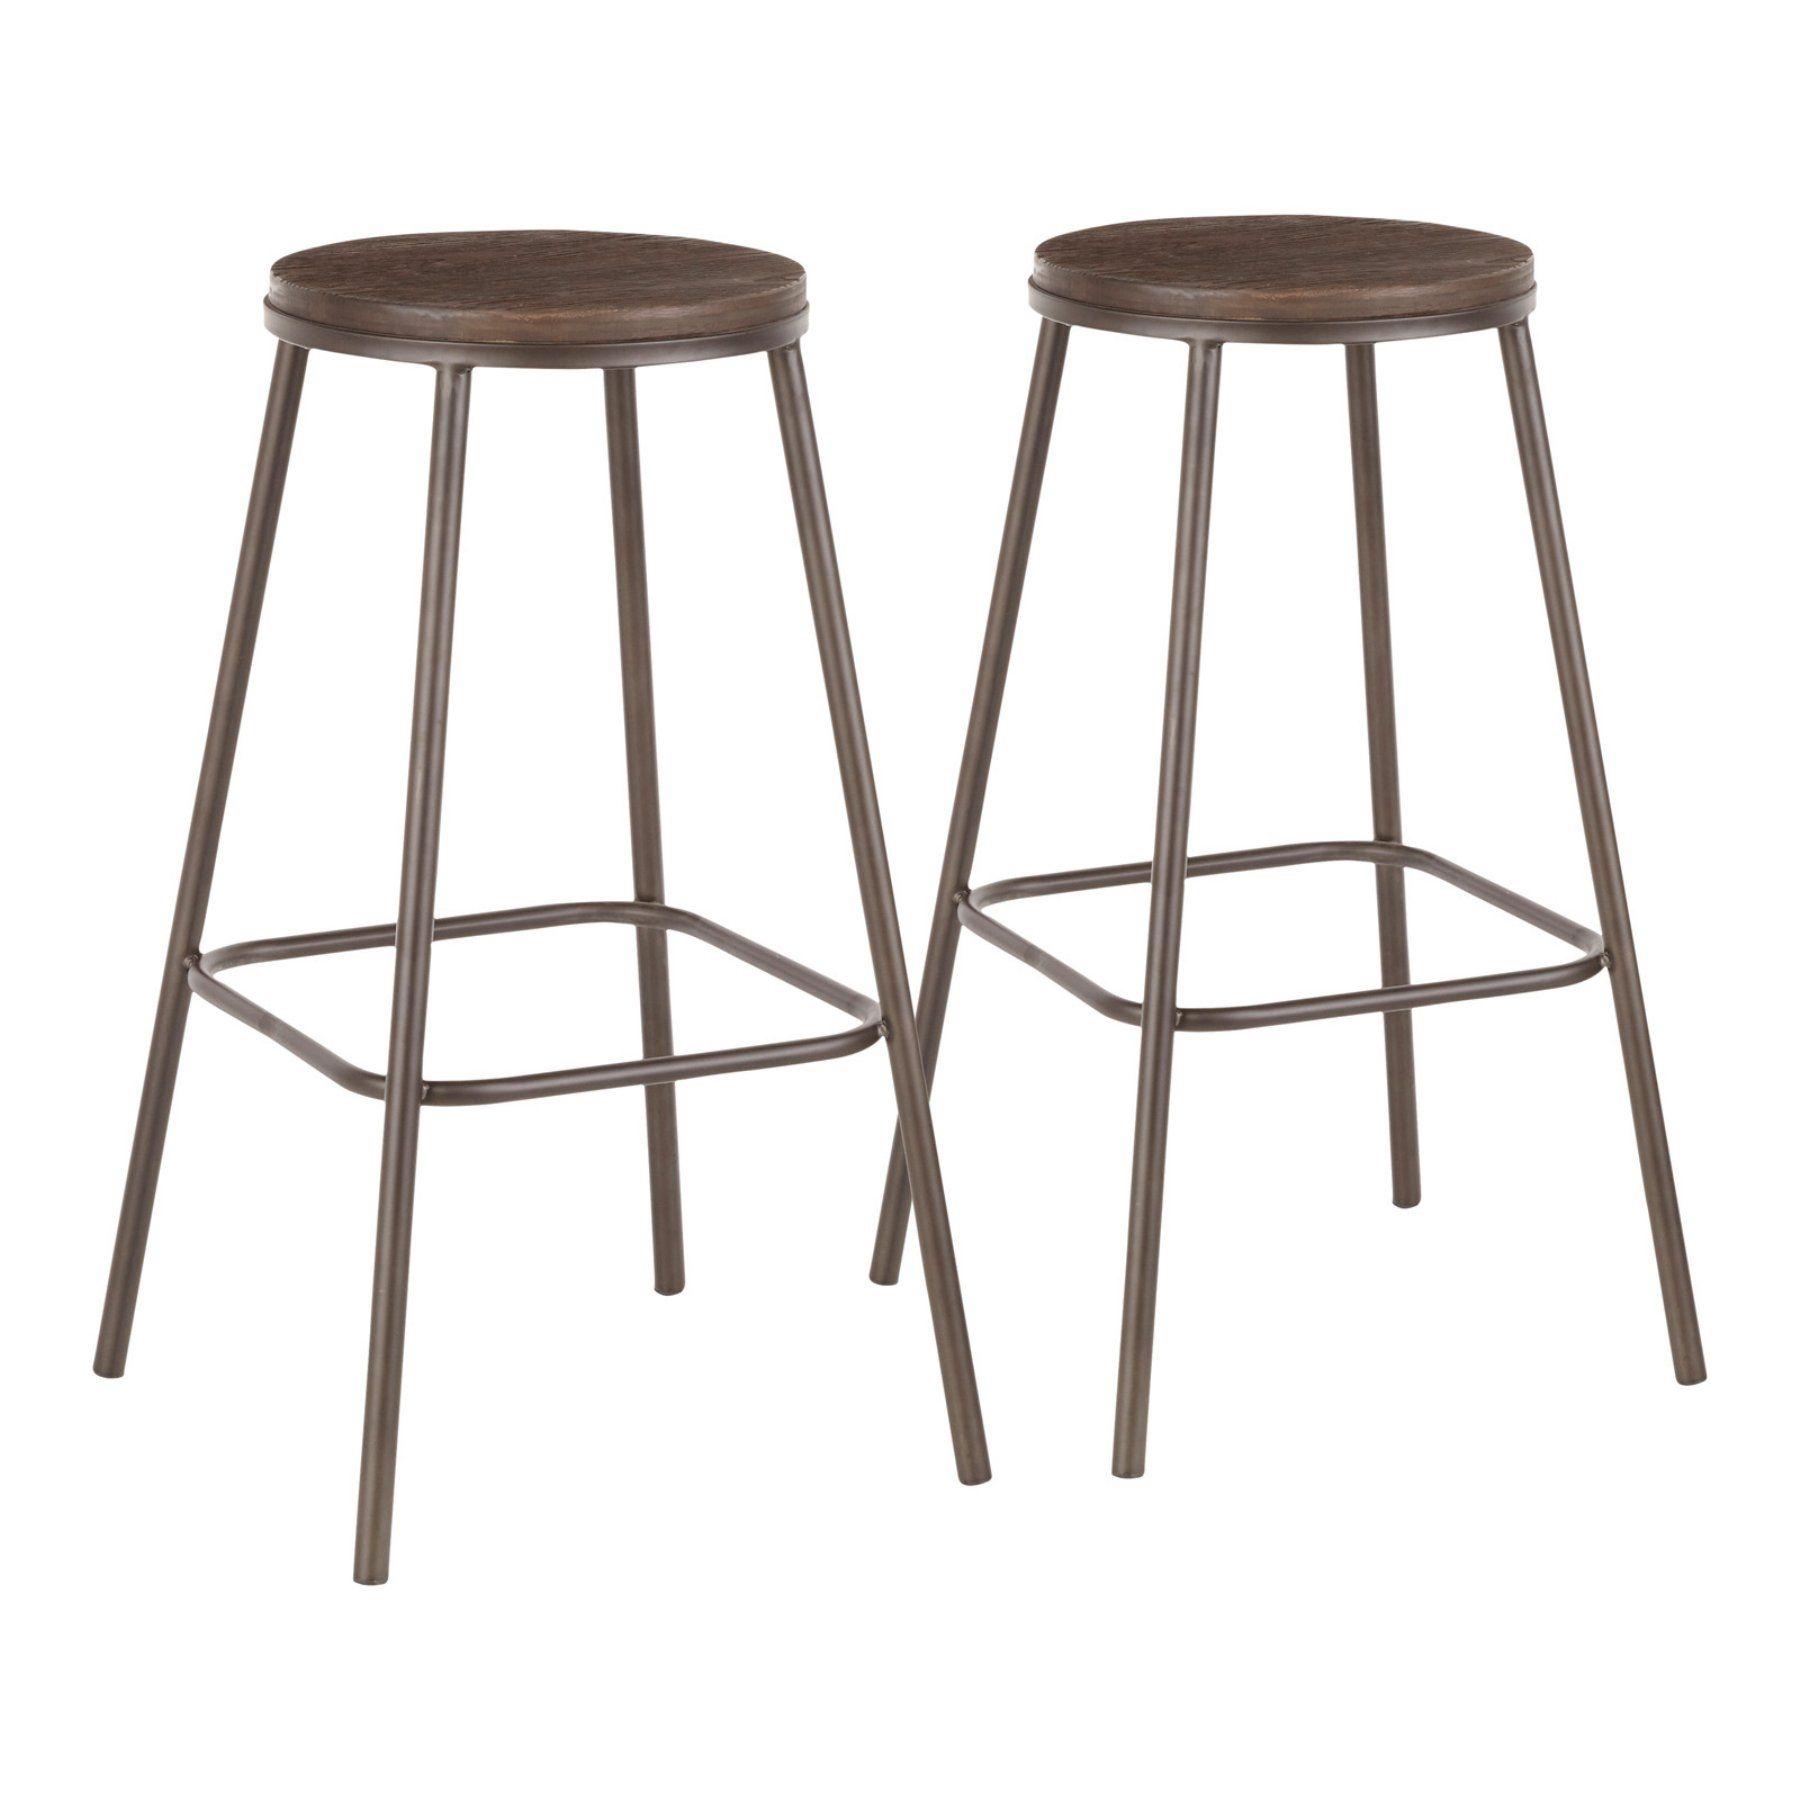 Lumisource Clara 30 In Round Backless Bar Stool Set Of 2 Wood